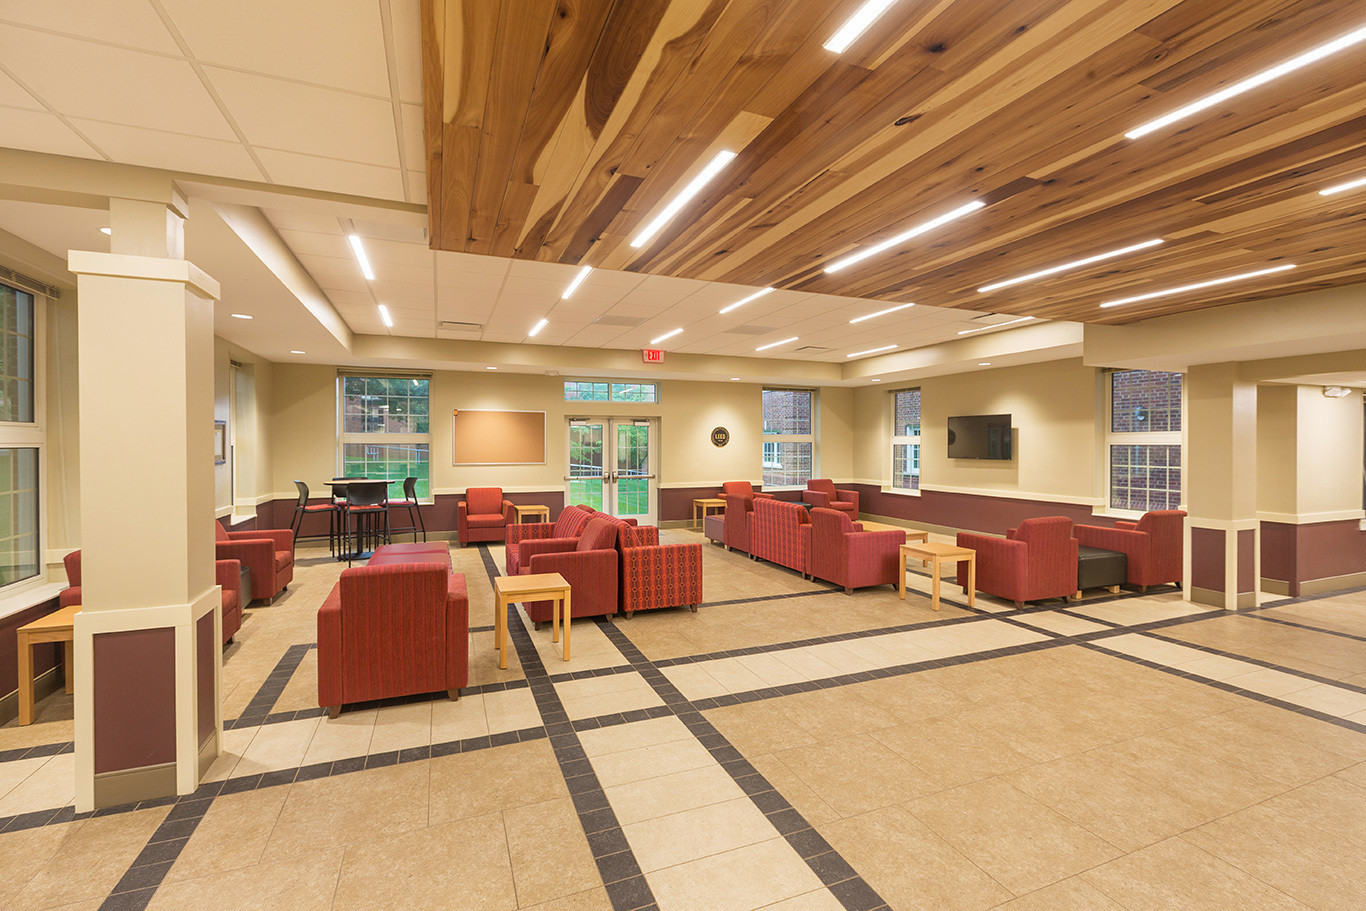 berea-bingham-hall-lobby